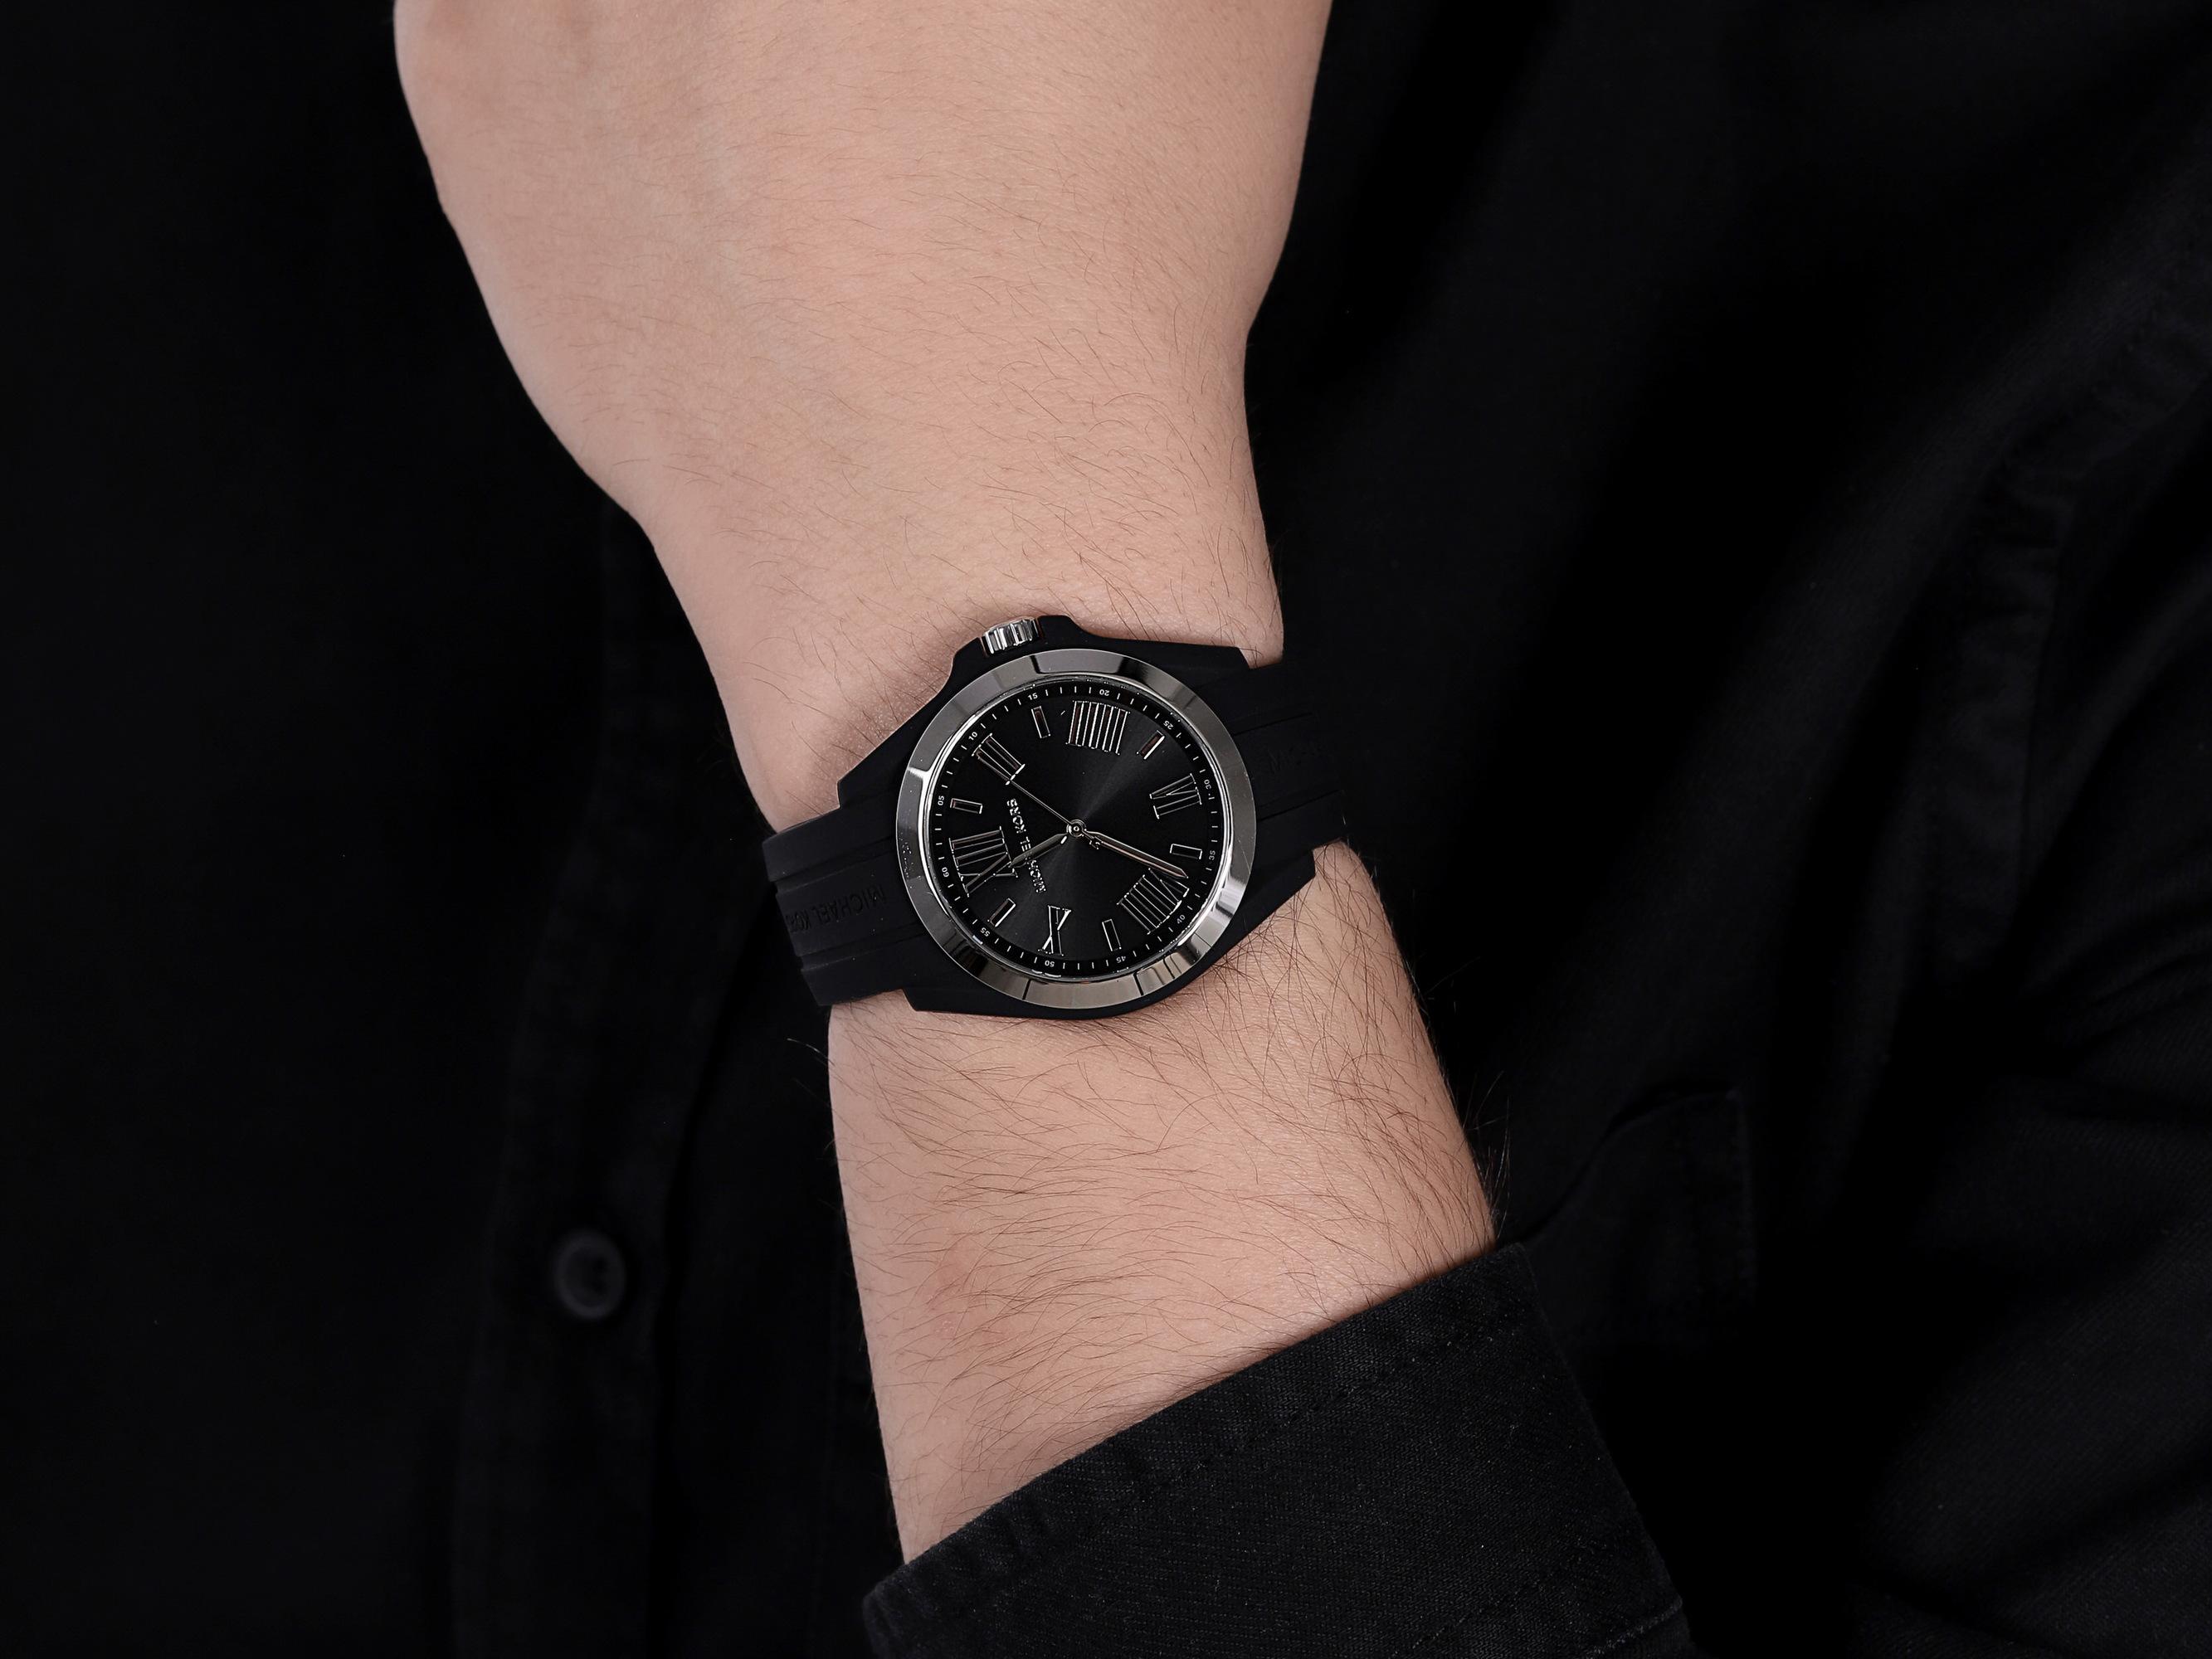 Michael Kors MK2729 męski zegarek Bradshaw pasek